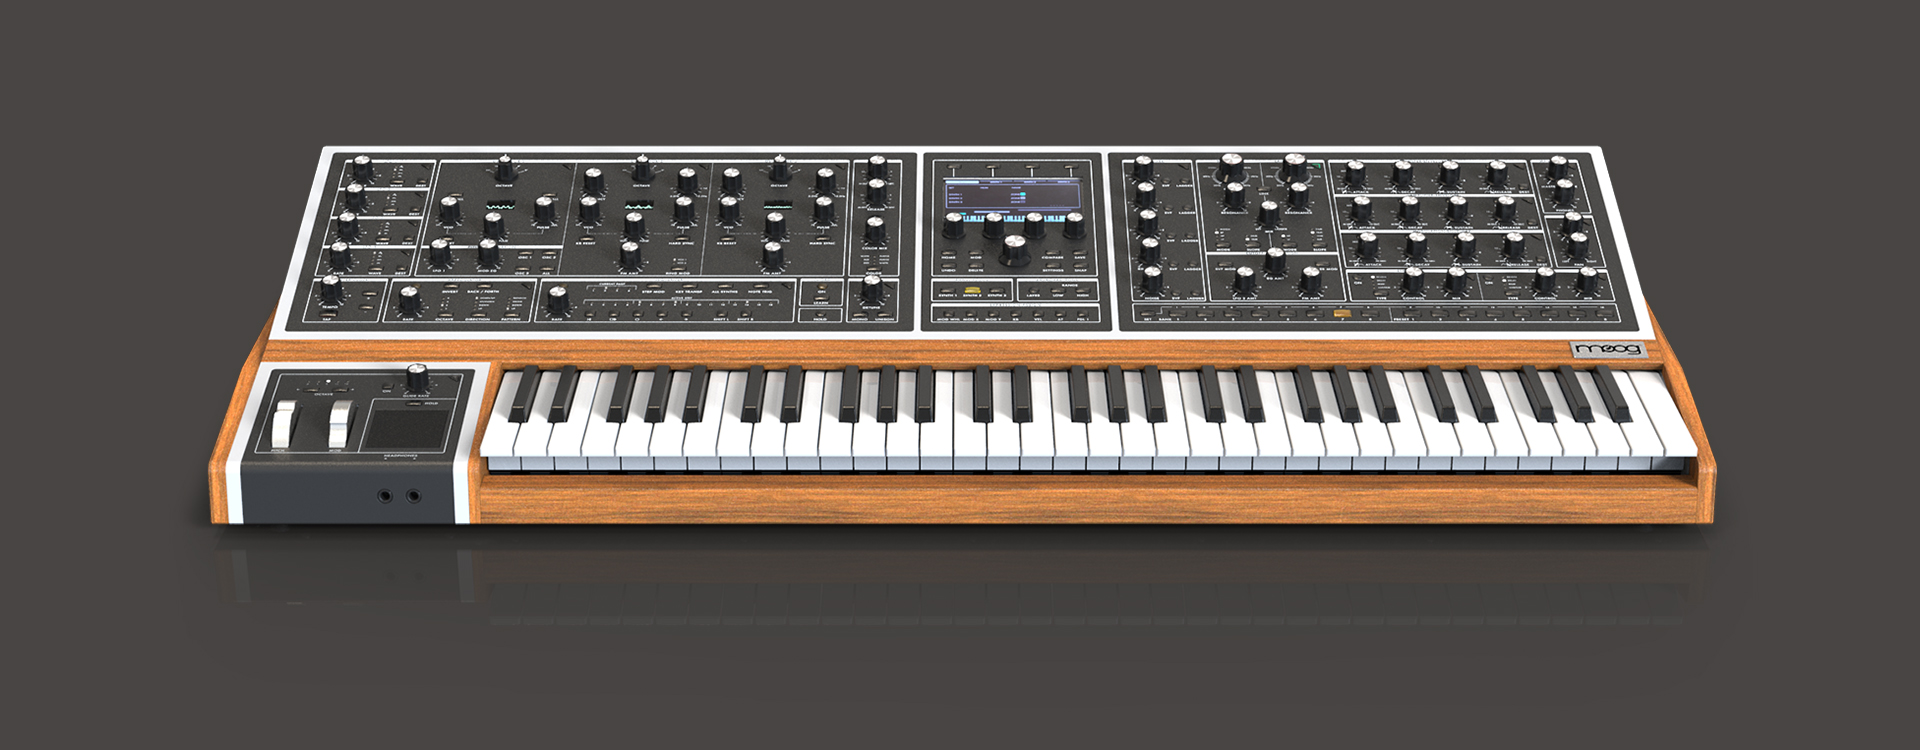 Moog One Startbild